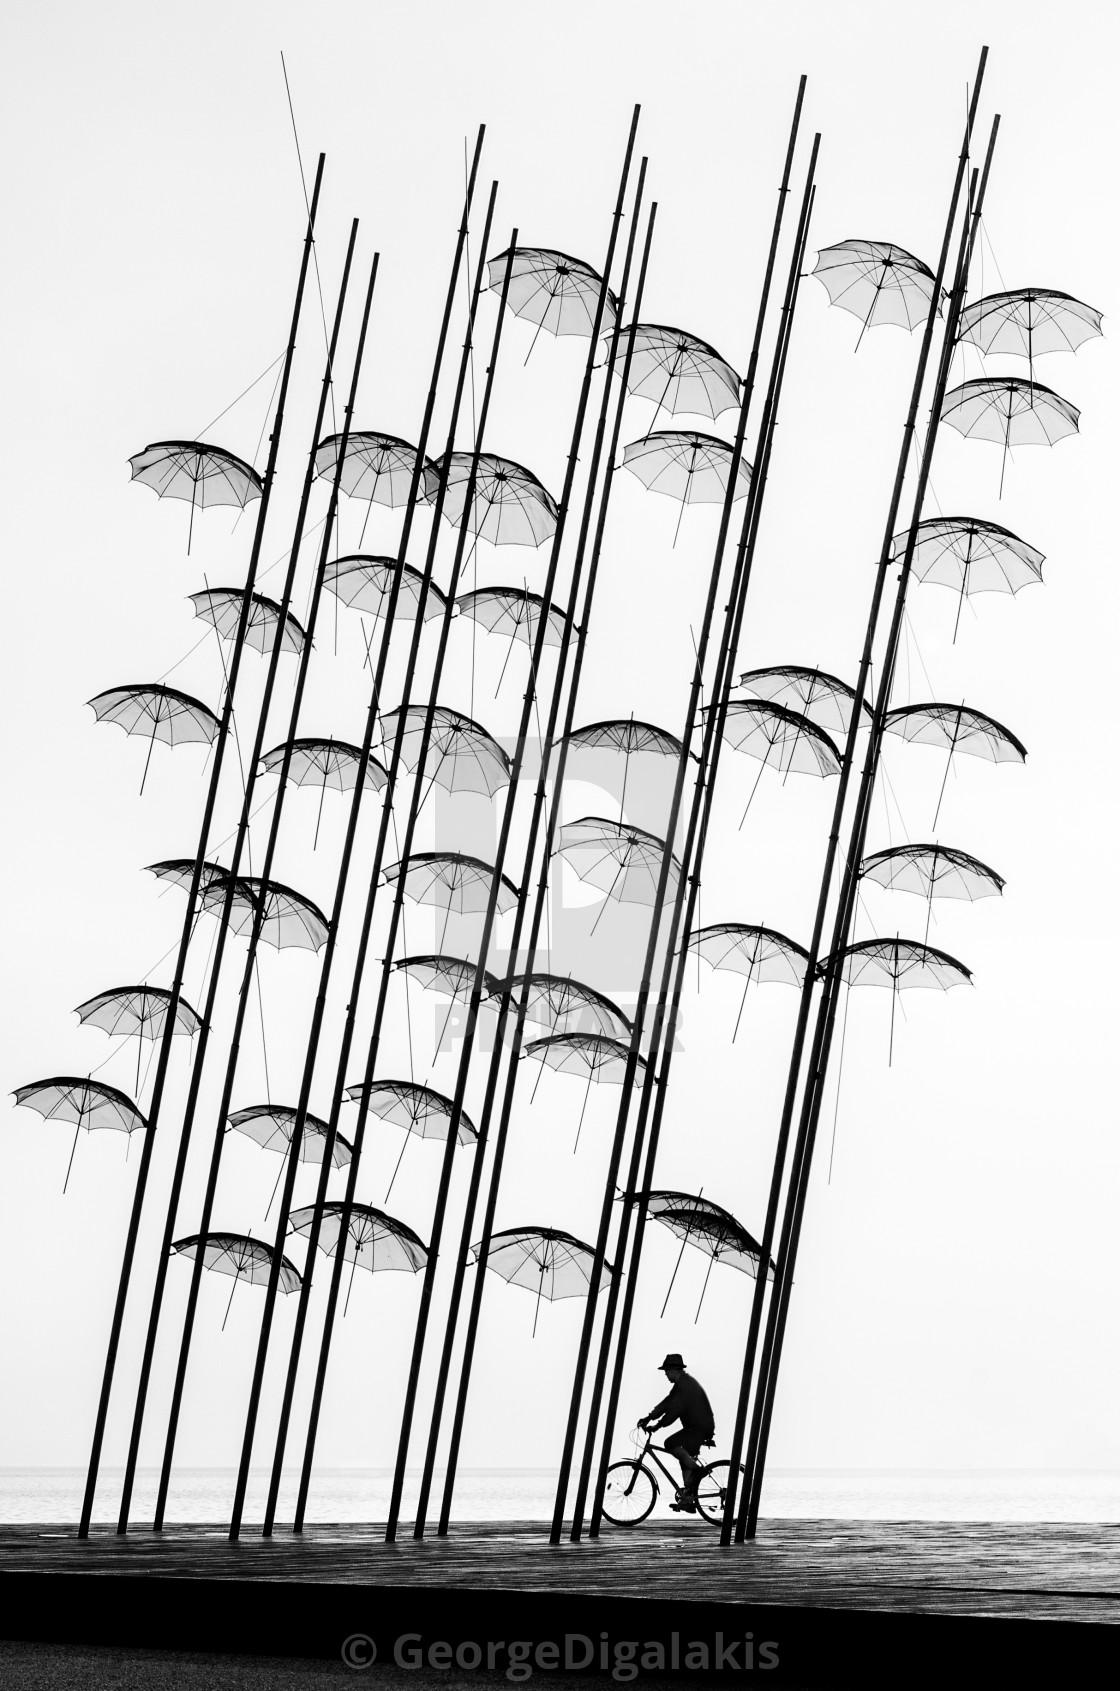 """Bicyclist under the umbrellas"" stock image"